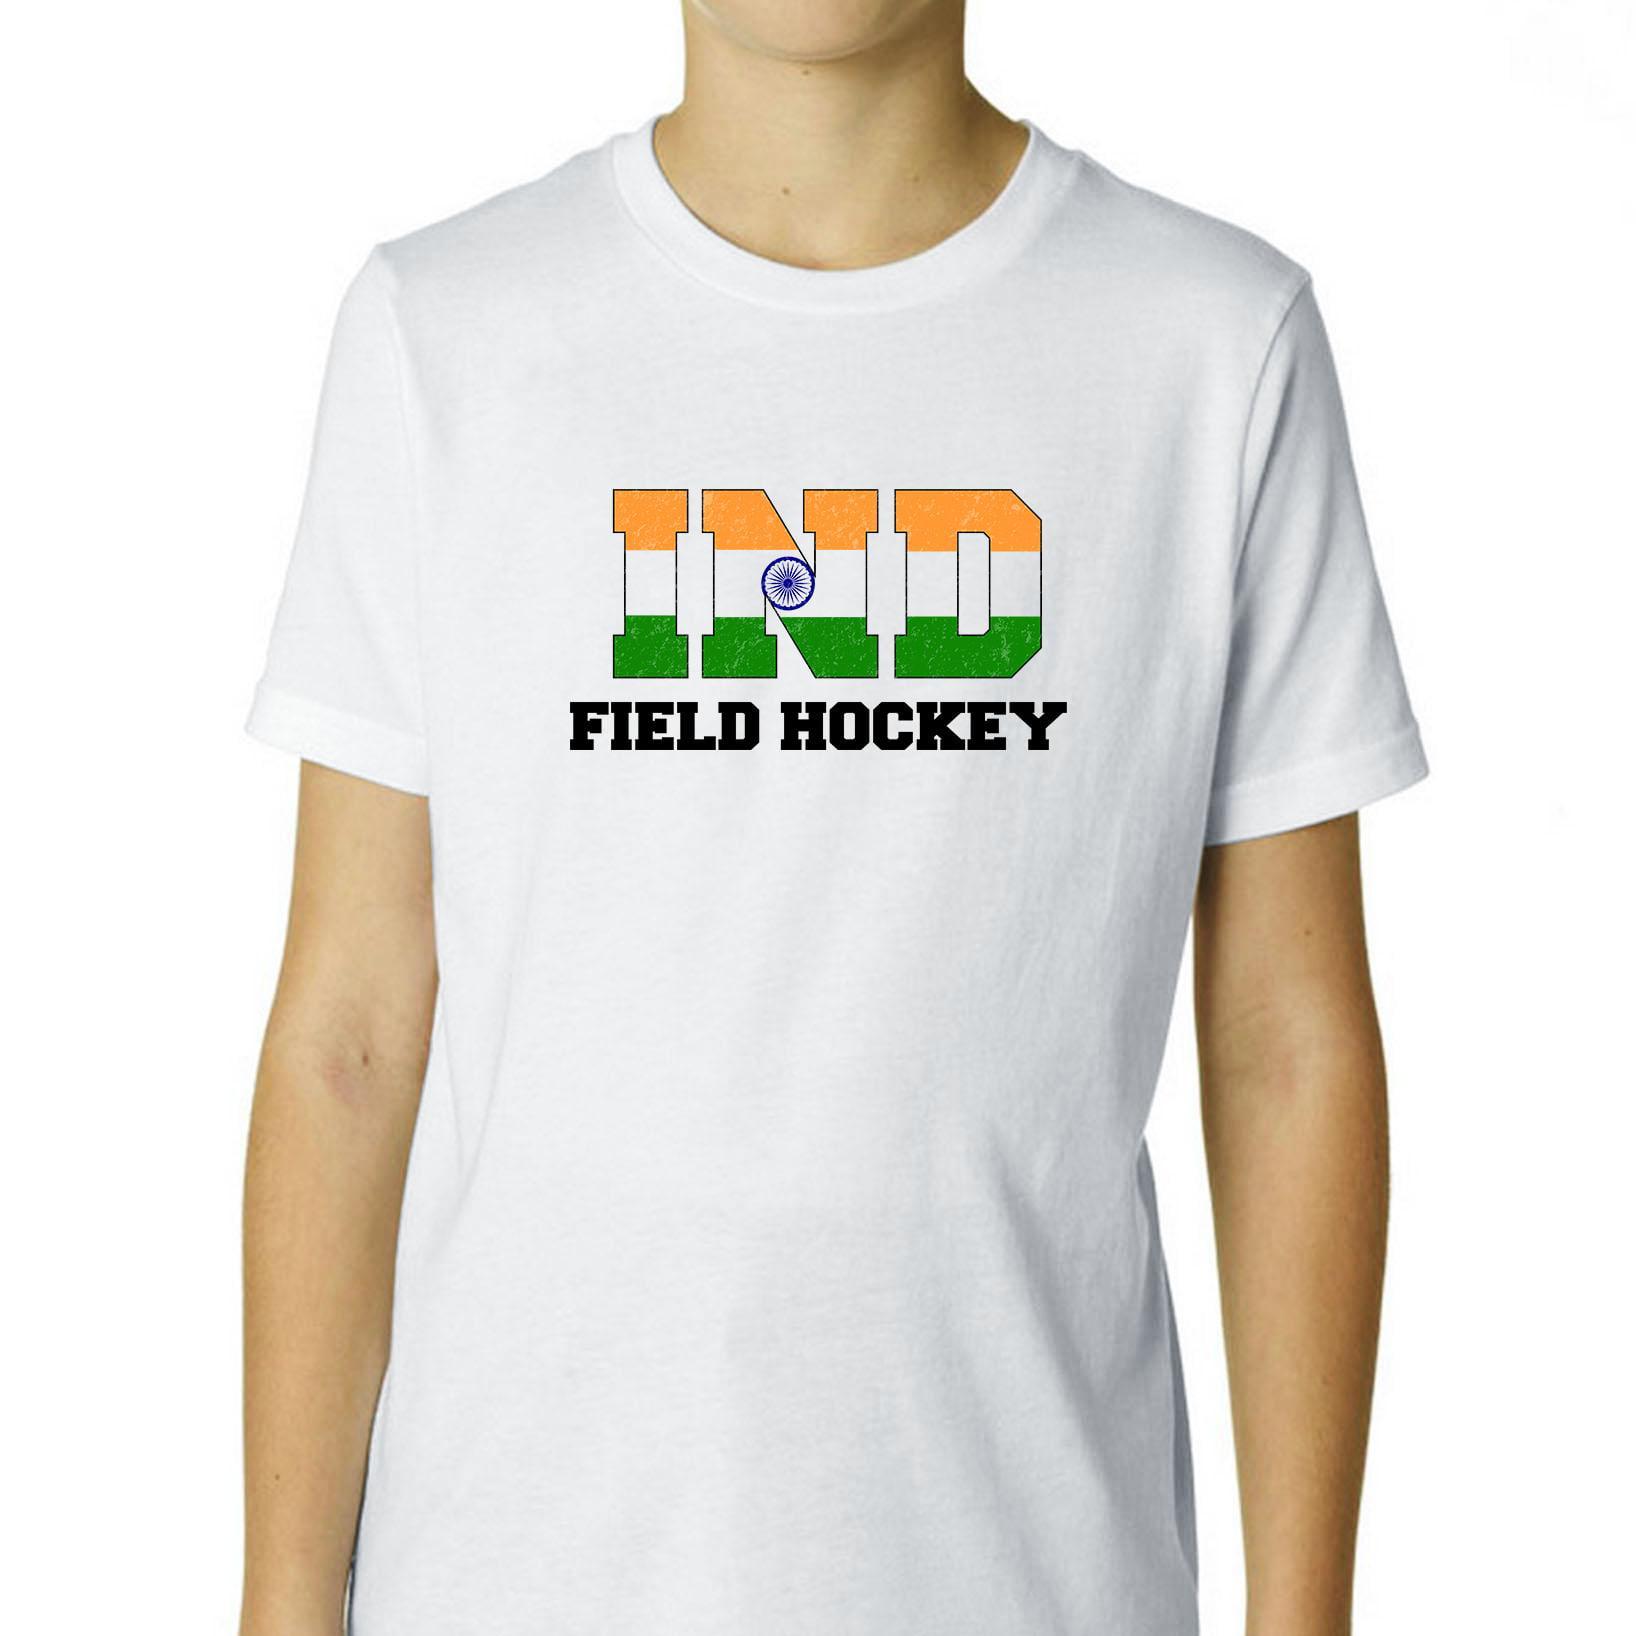 India Field Hockey Olympic Games Rio Flag Boy's Cotton Youth T-Shirt by Hollywood Thread